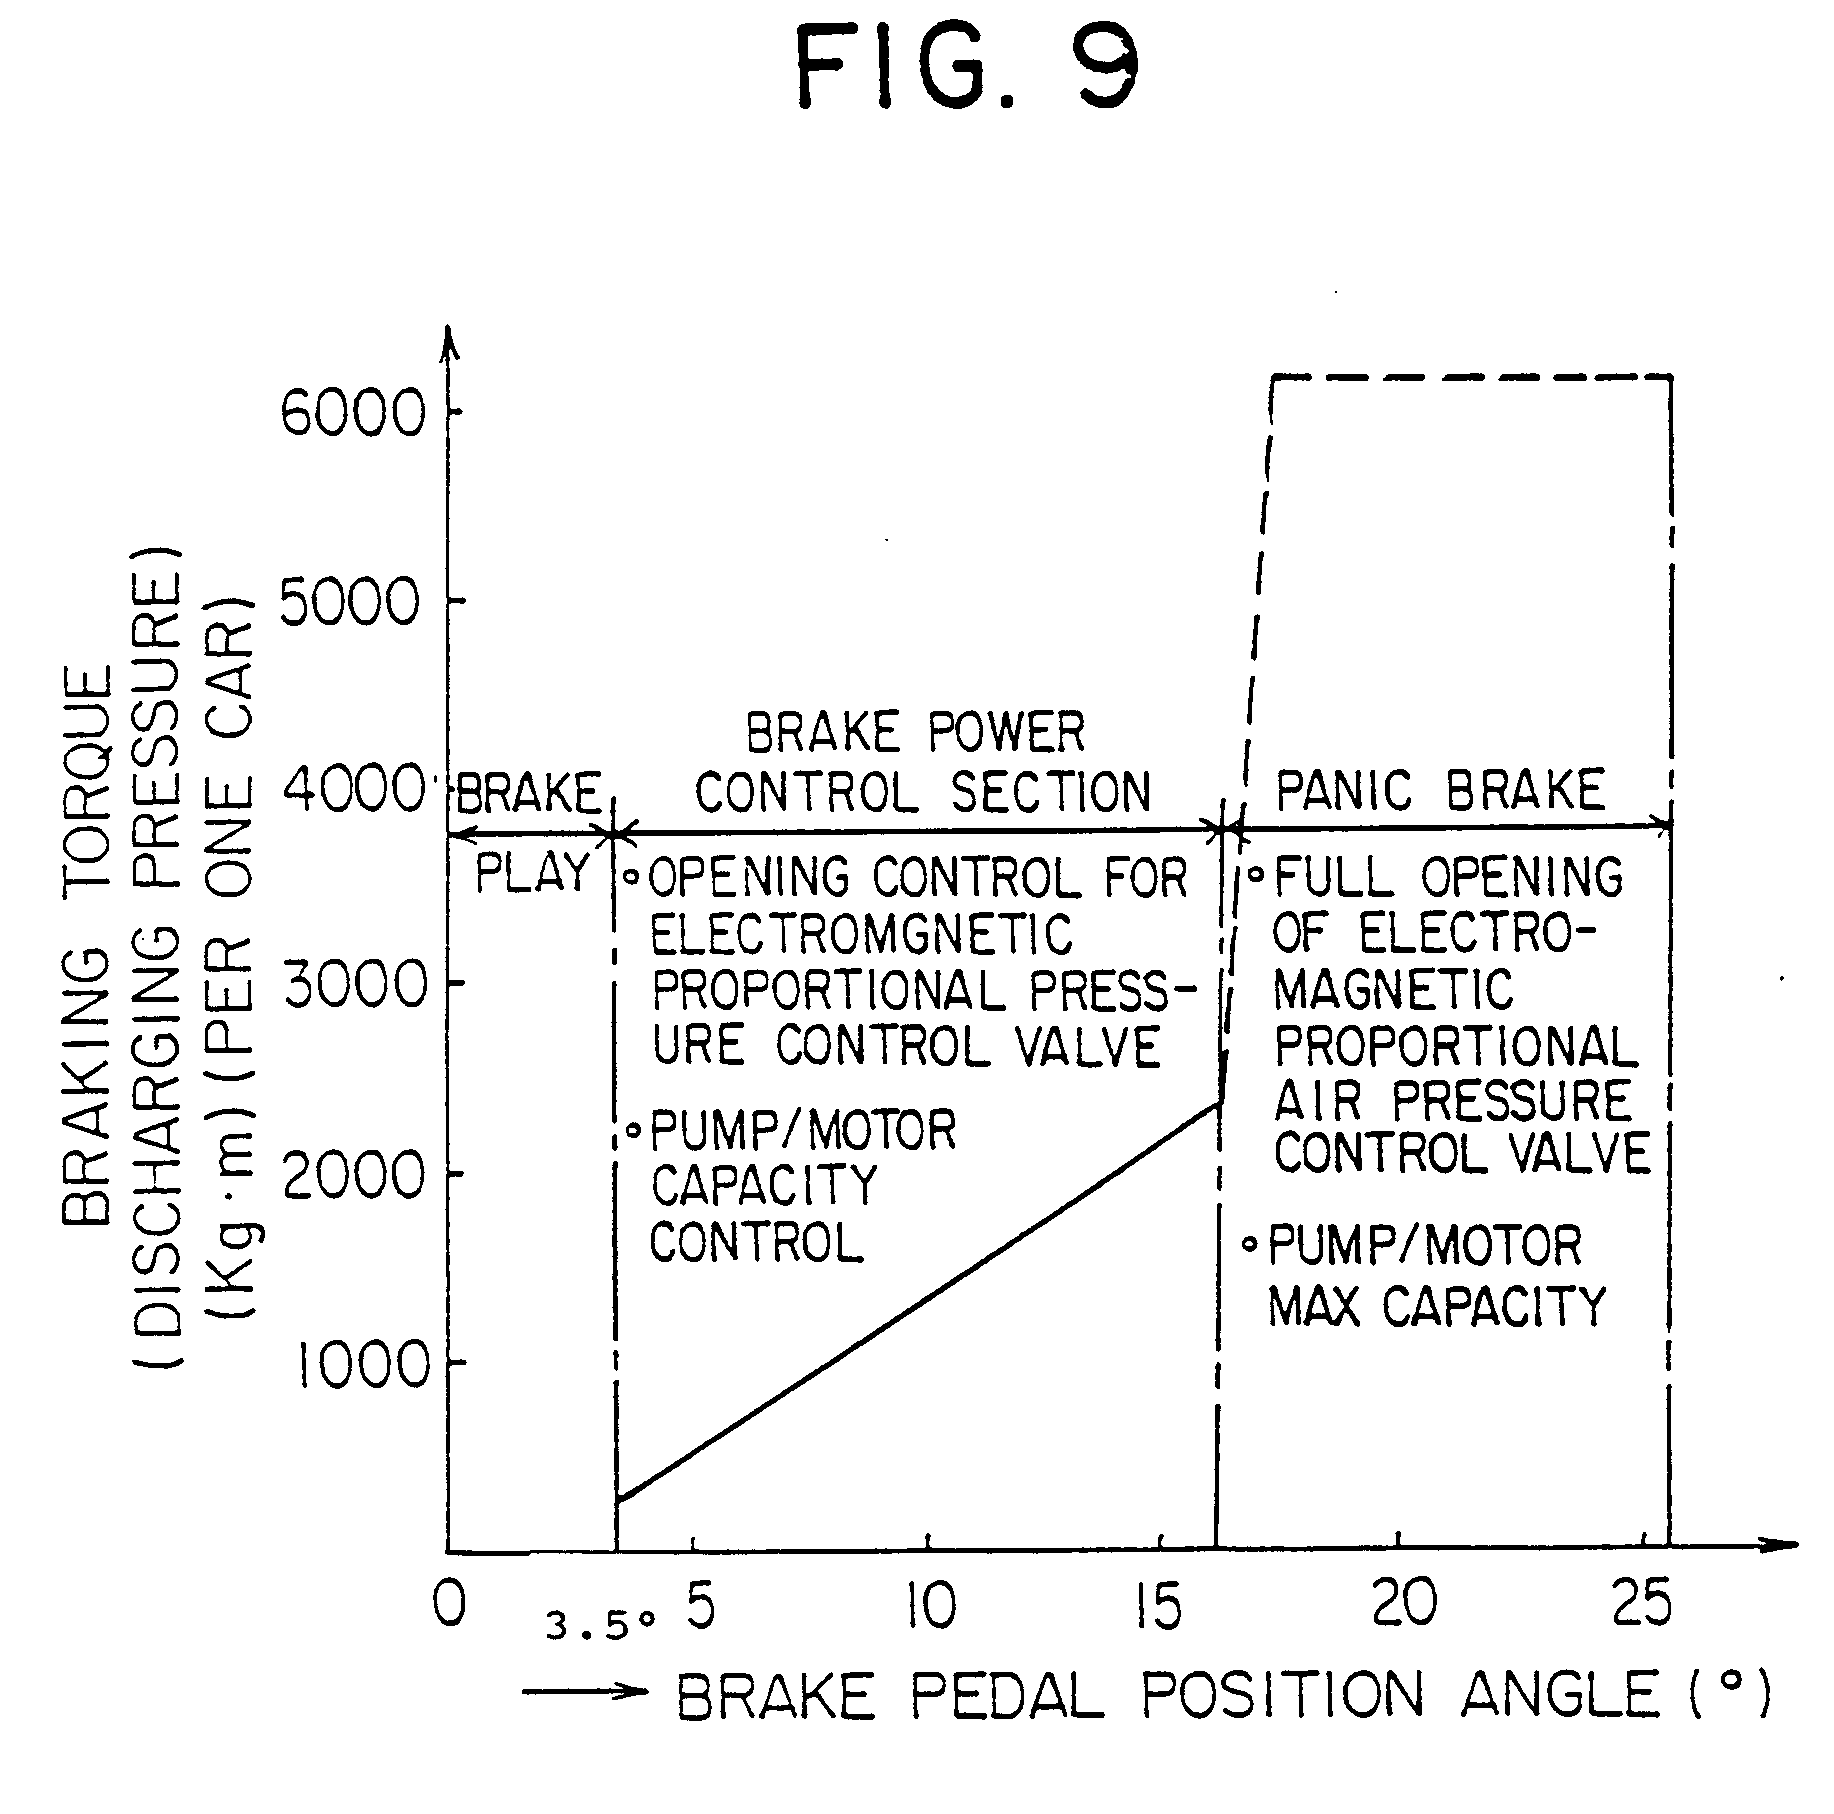 patent ep0366088b1 syst me de freinage r cup ration d 39 nergie pour v hicule google patents. Black Bedroom Furniture Sets. Home Design Ideas